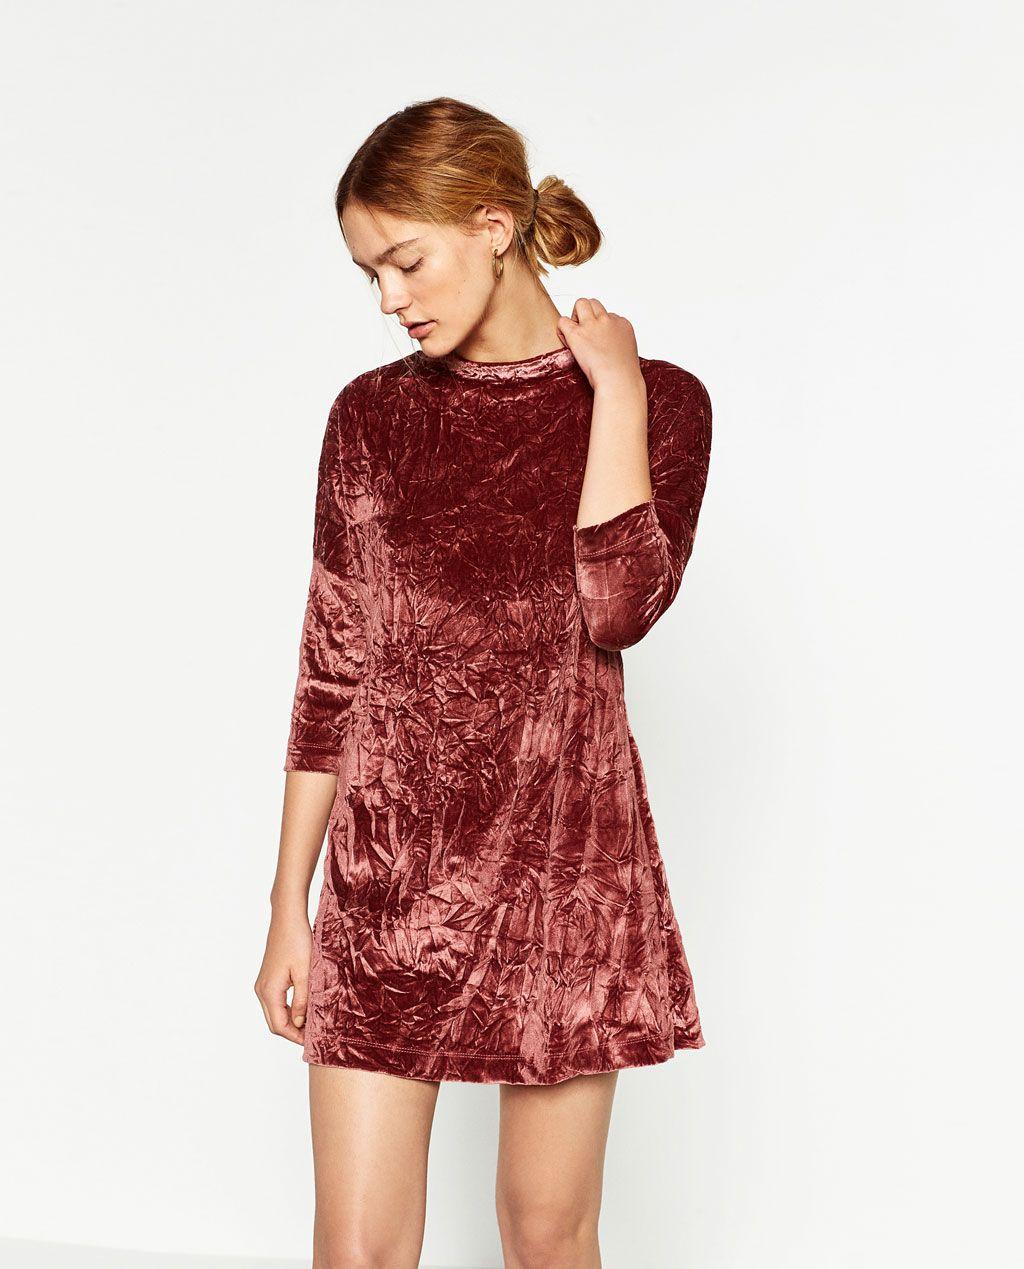 Imagen 2 De Vestido Terciopelo De Zara Modestil Samtkleid Kleider